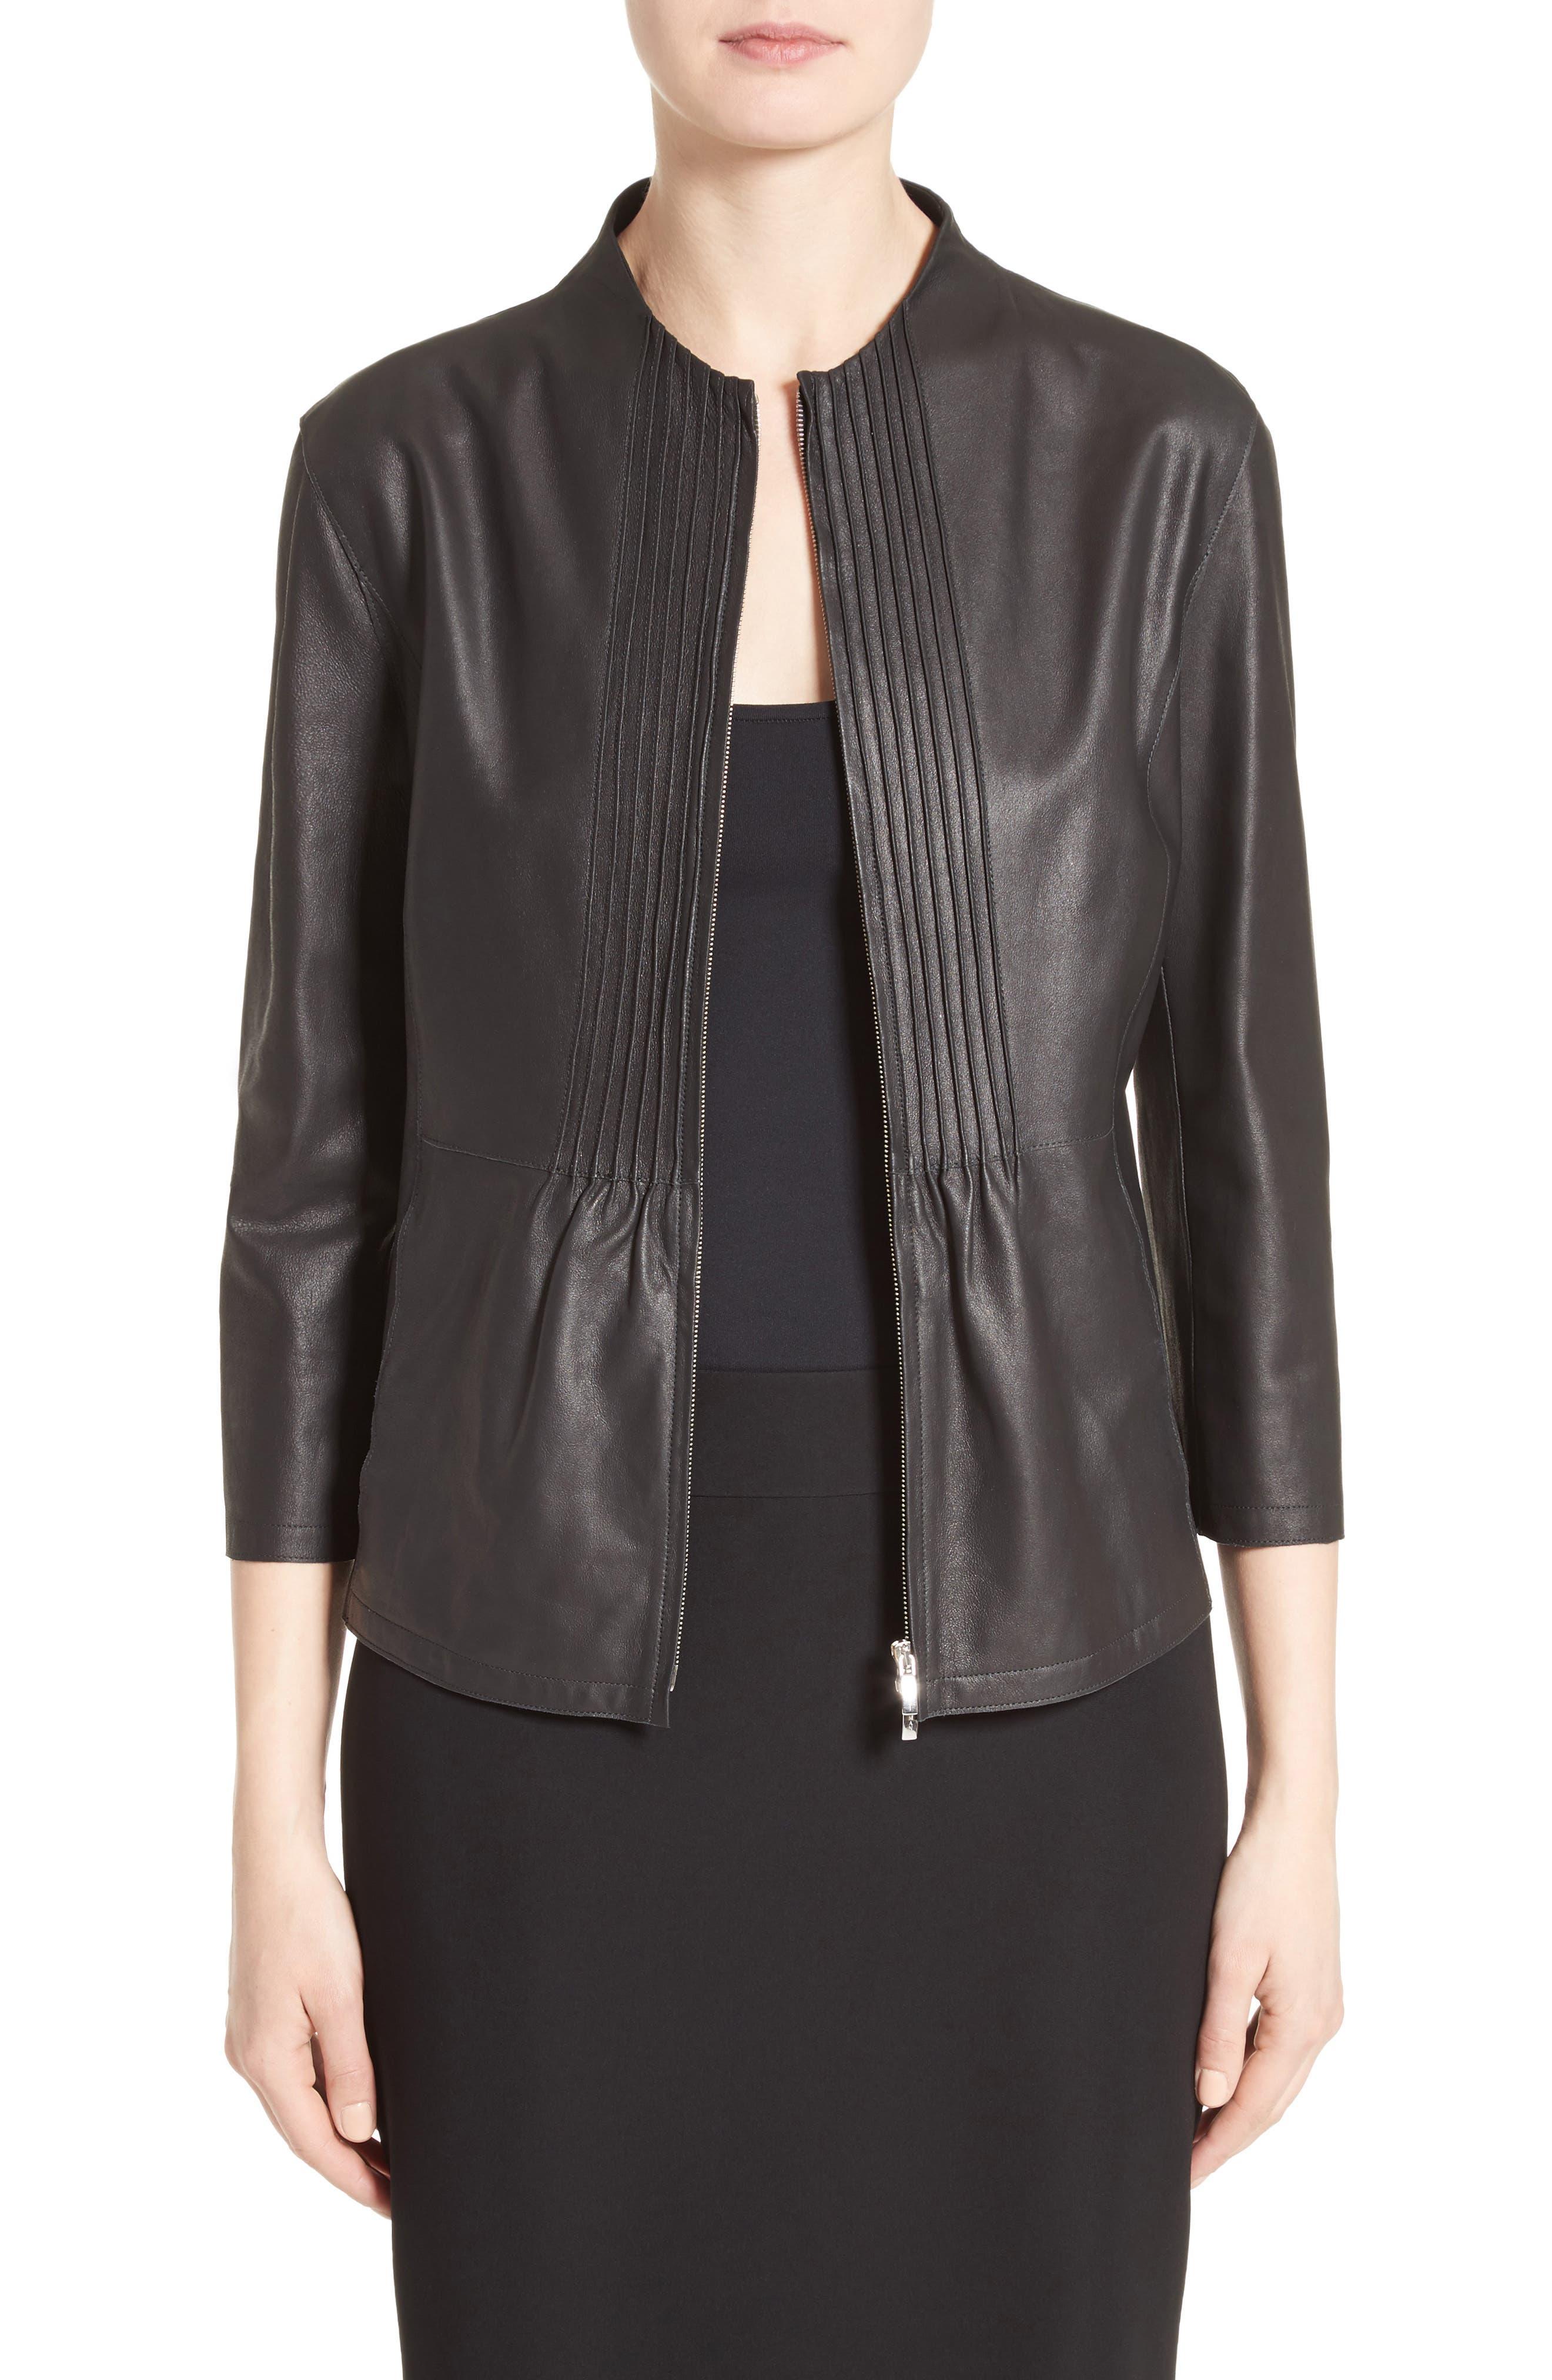 ARMANI COLLEZIONI Pintuck Leather Jacket